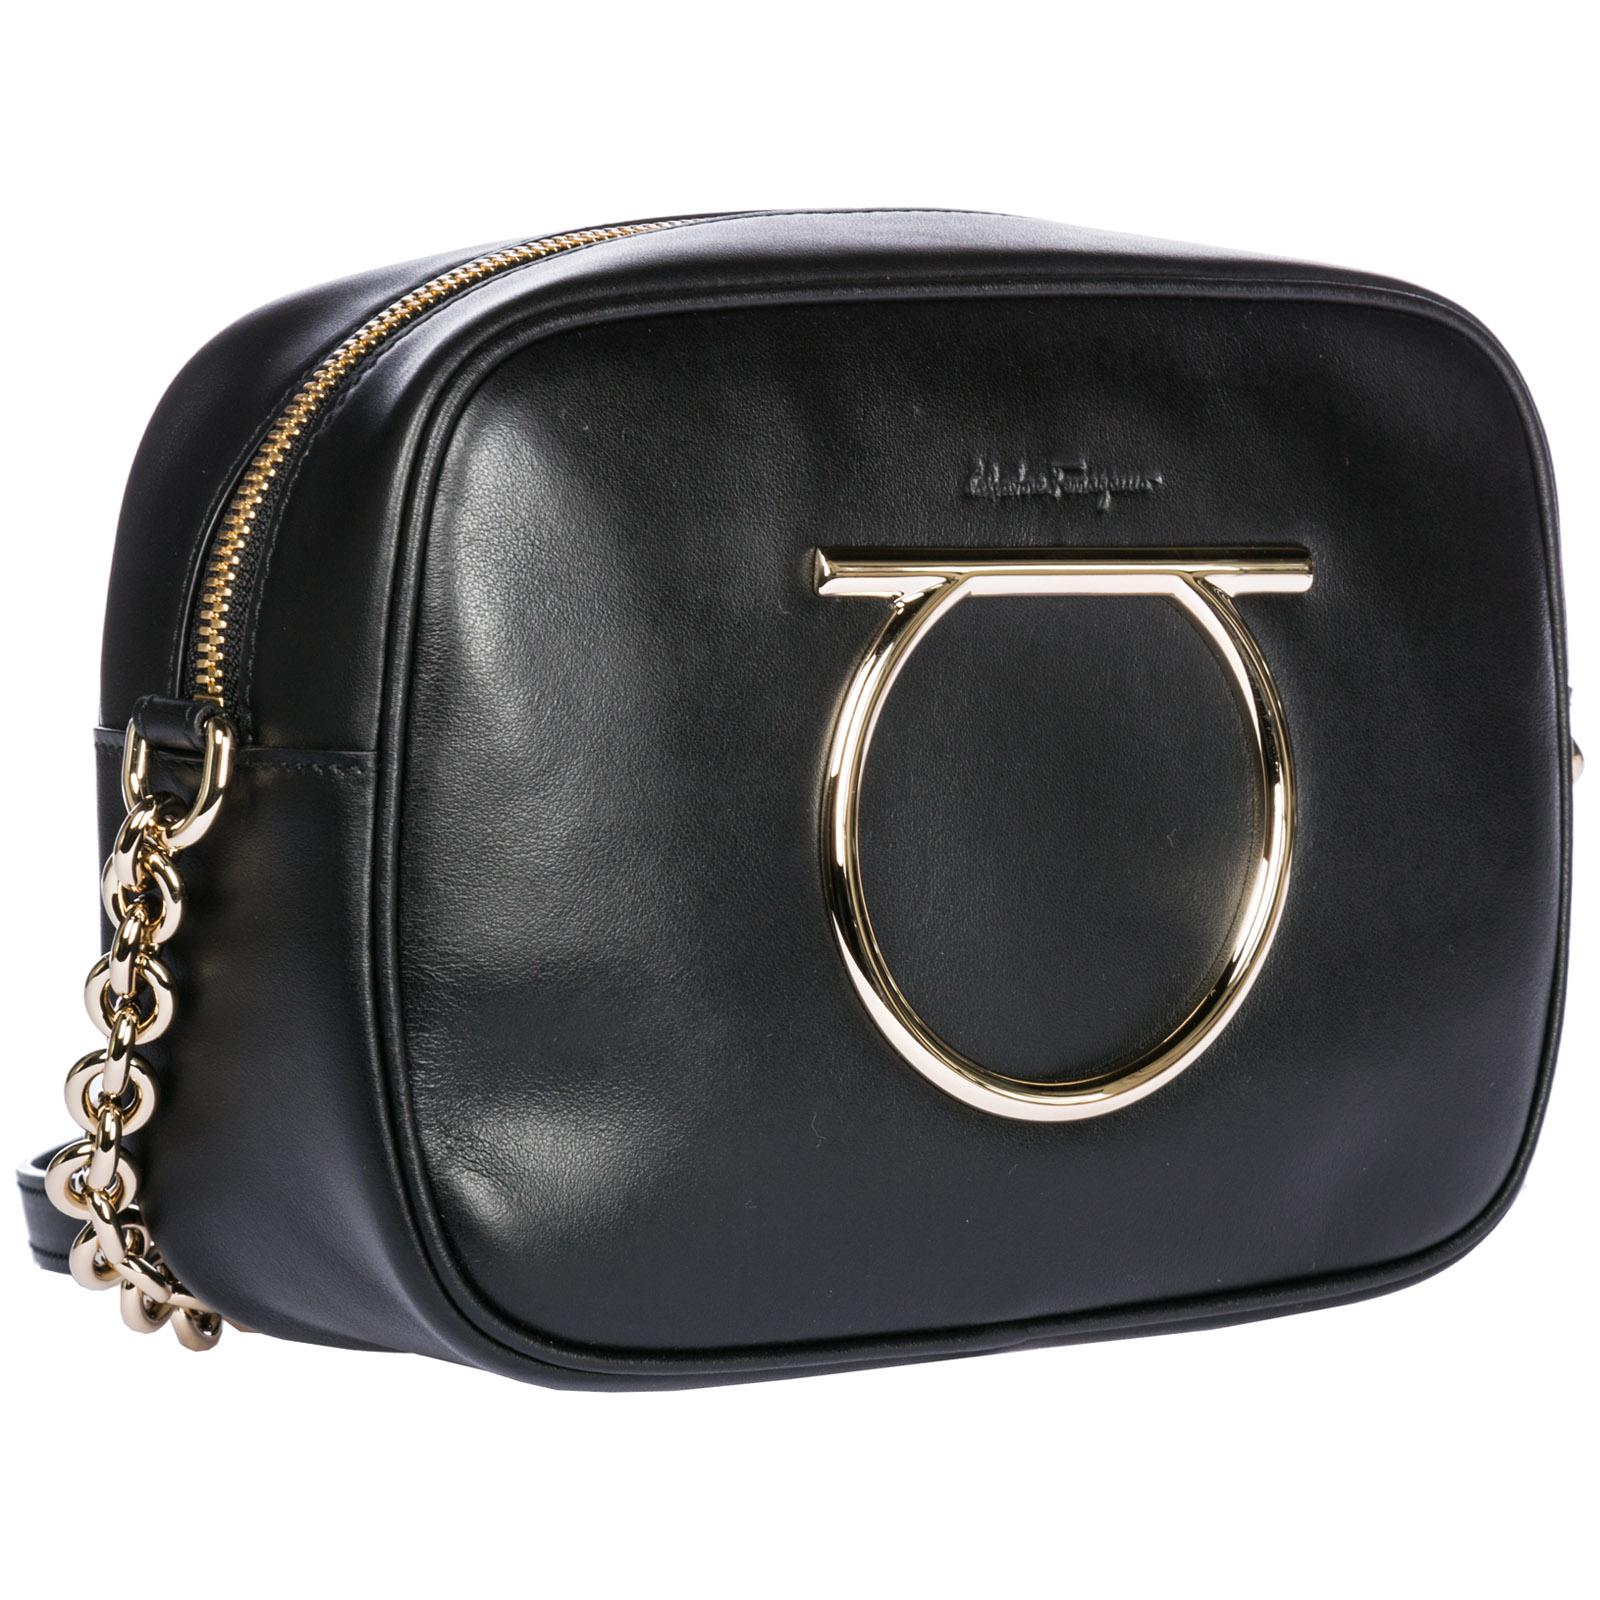 5c97195c4012 ... Women s leather cross-body messenger shoulder bag camera bag gancini ...